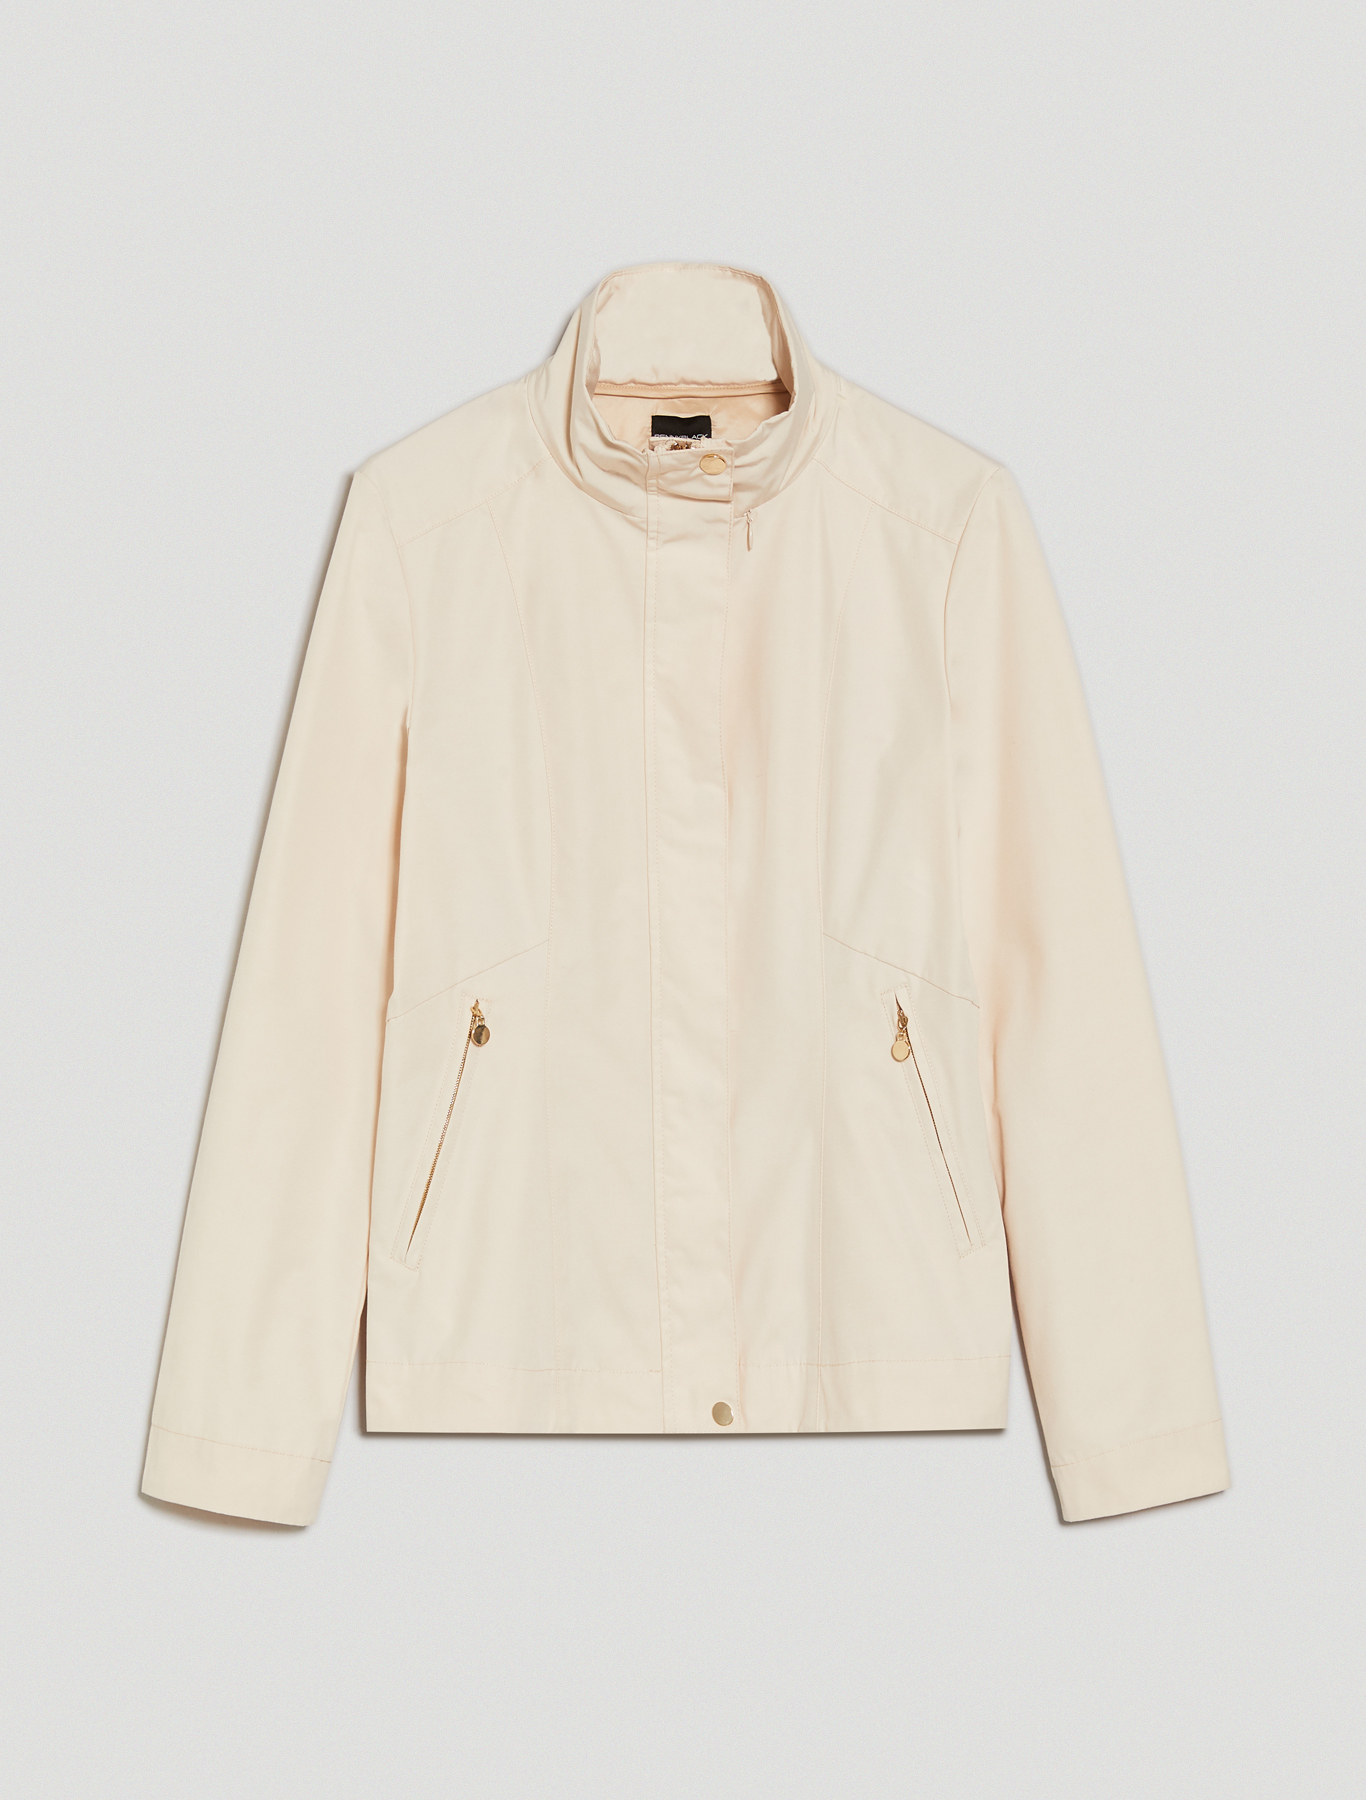 Rainproof faille jacket - ivory - pennyblack